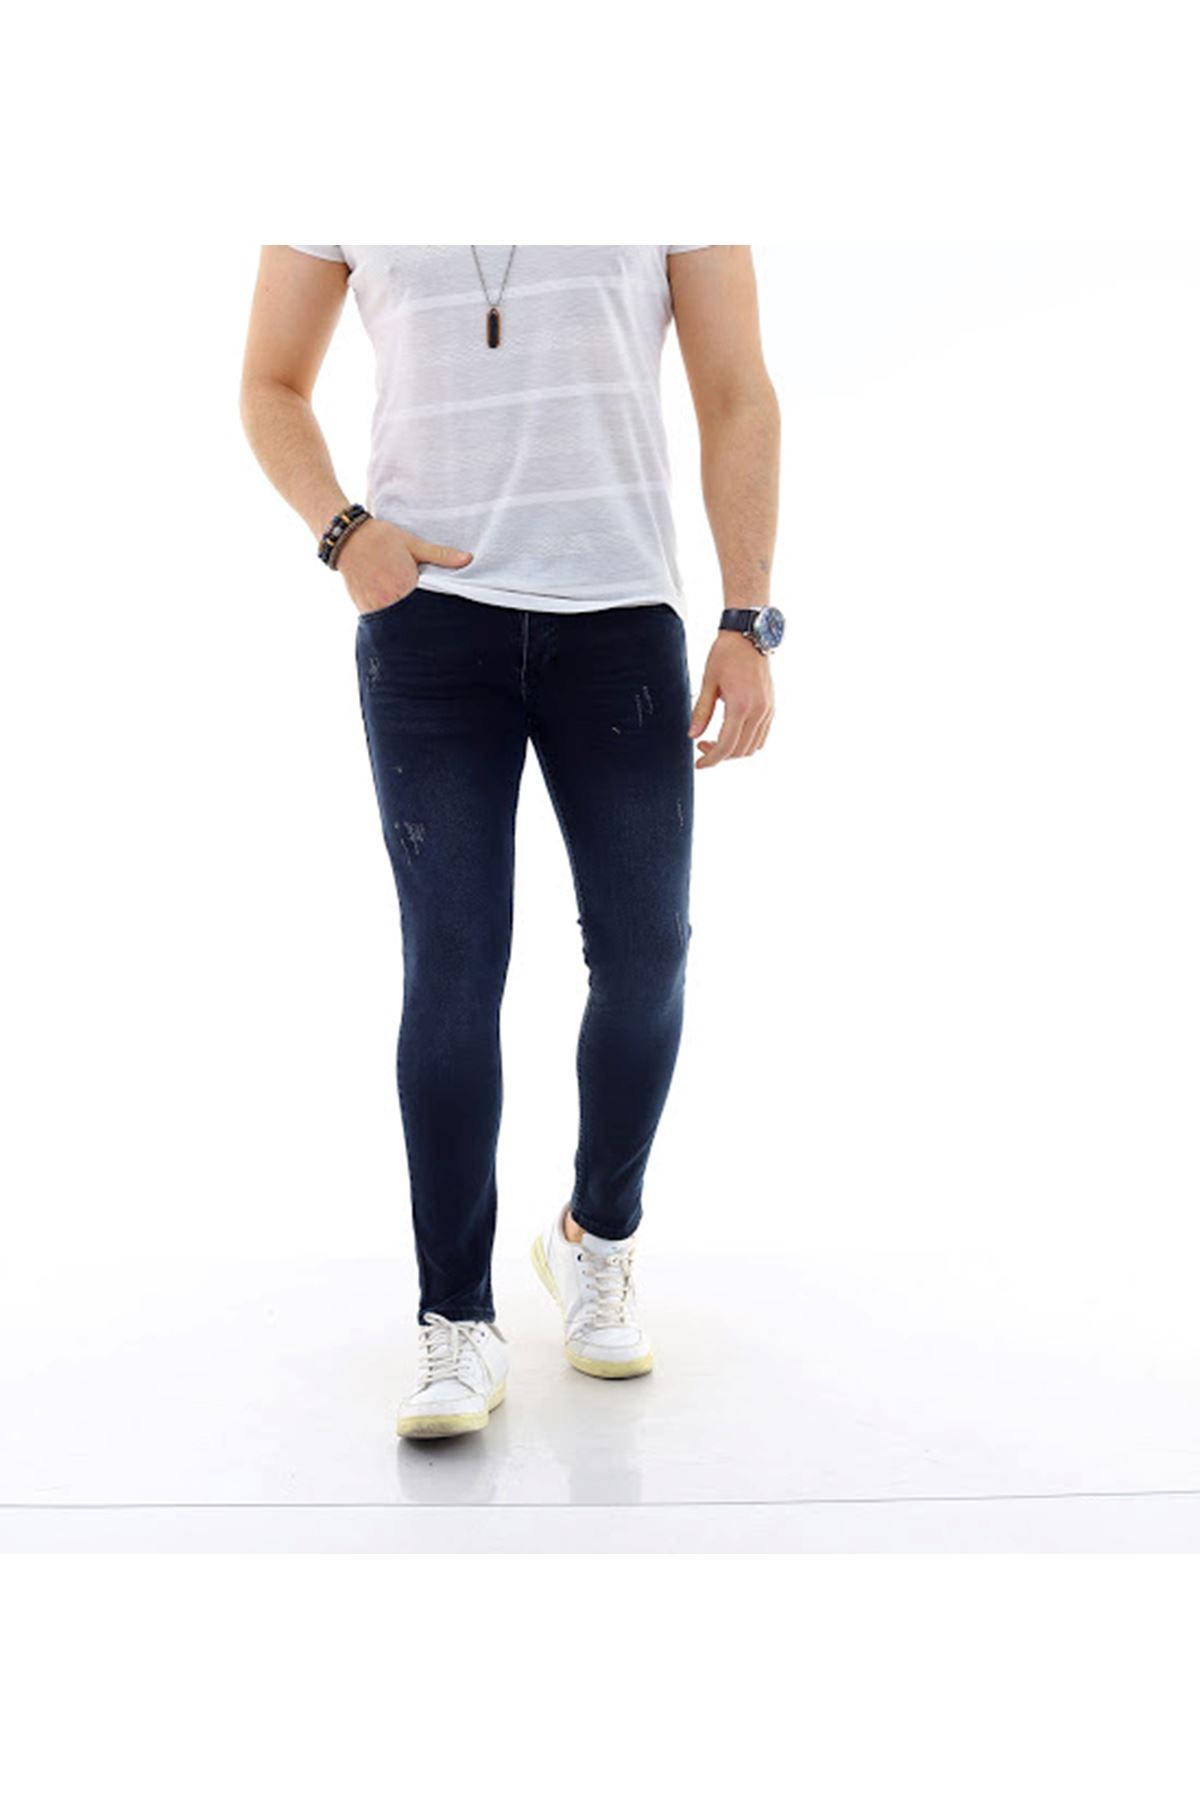 Erkek Y. Tint Slim Denim Jeans Kot Ceket + Y. Tint Lazer Tırnaklı Denim Jean Pantolon